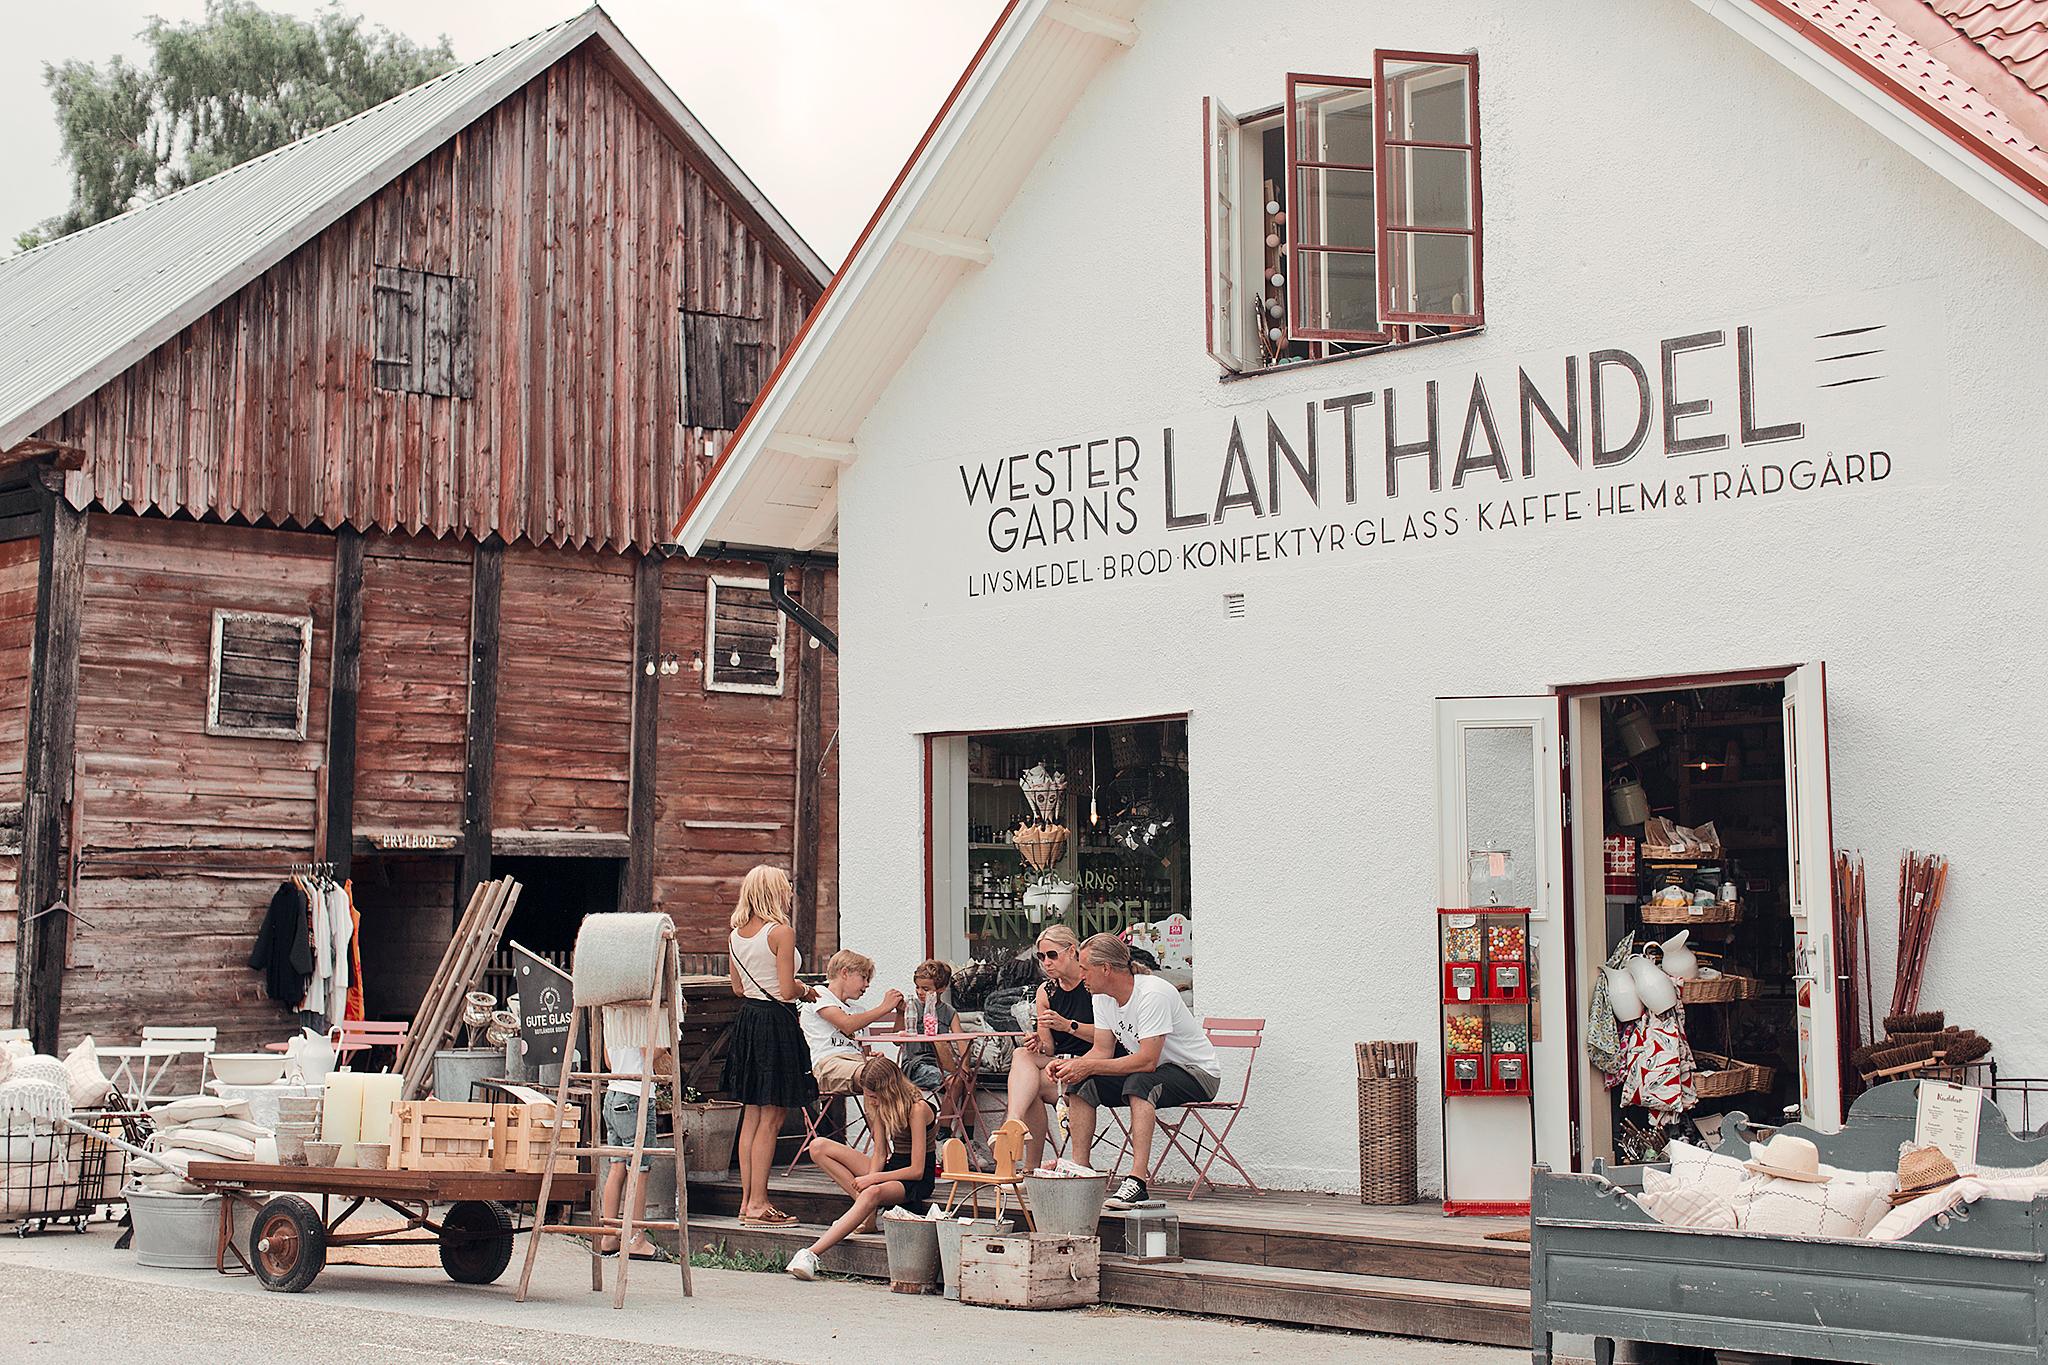 Resedagbok Gotland: Westergarns Lanthandel